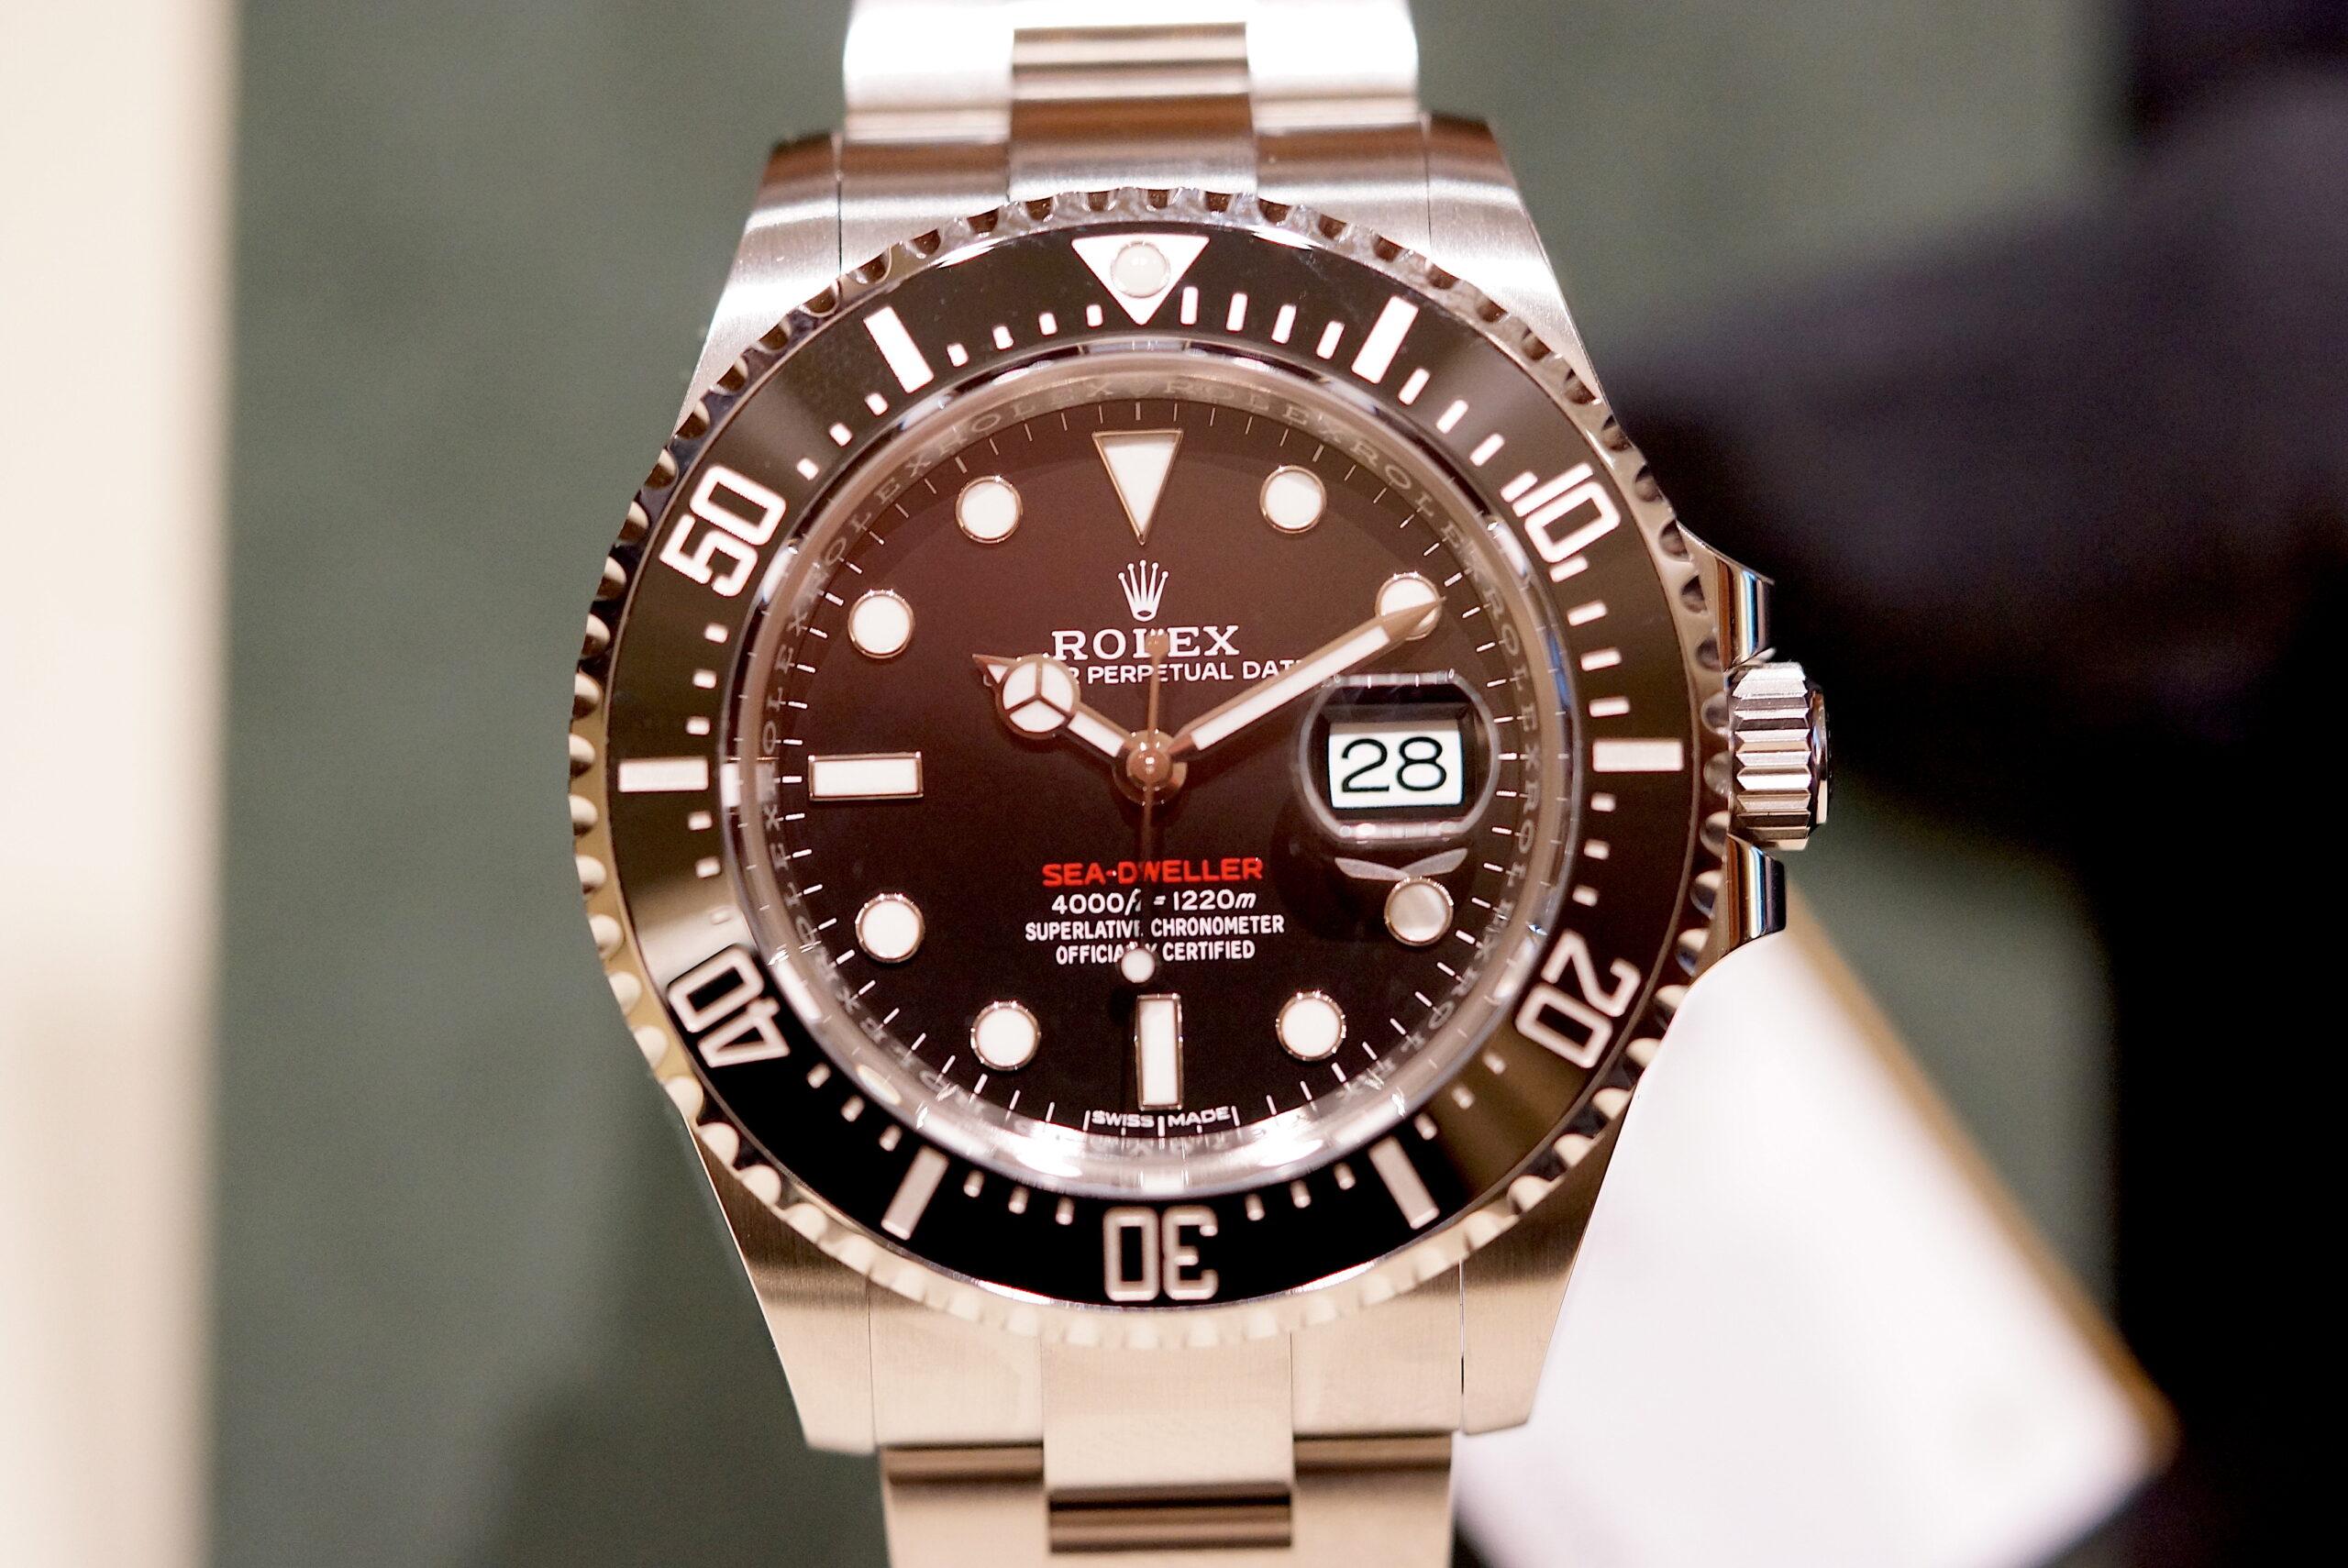 Rolex Oyster Perpetual 'Sea-Dweller'